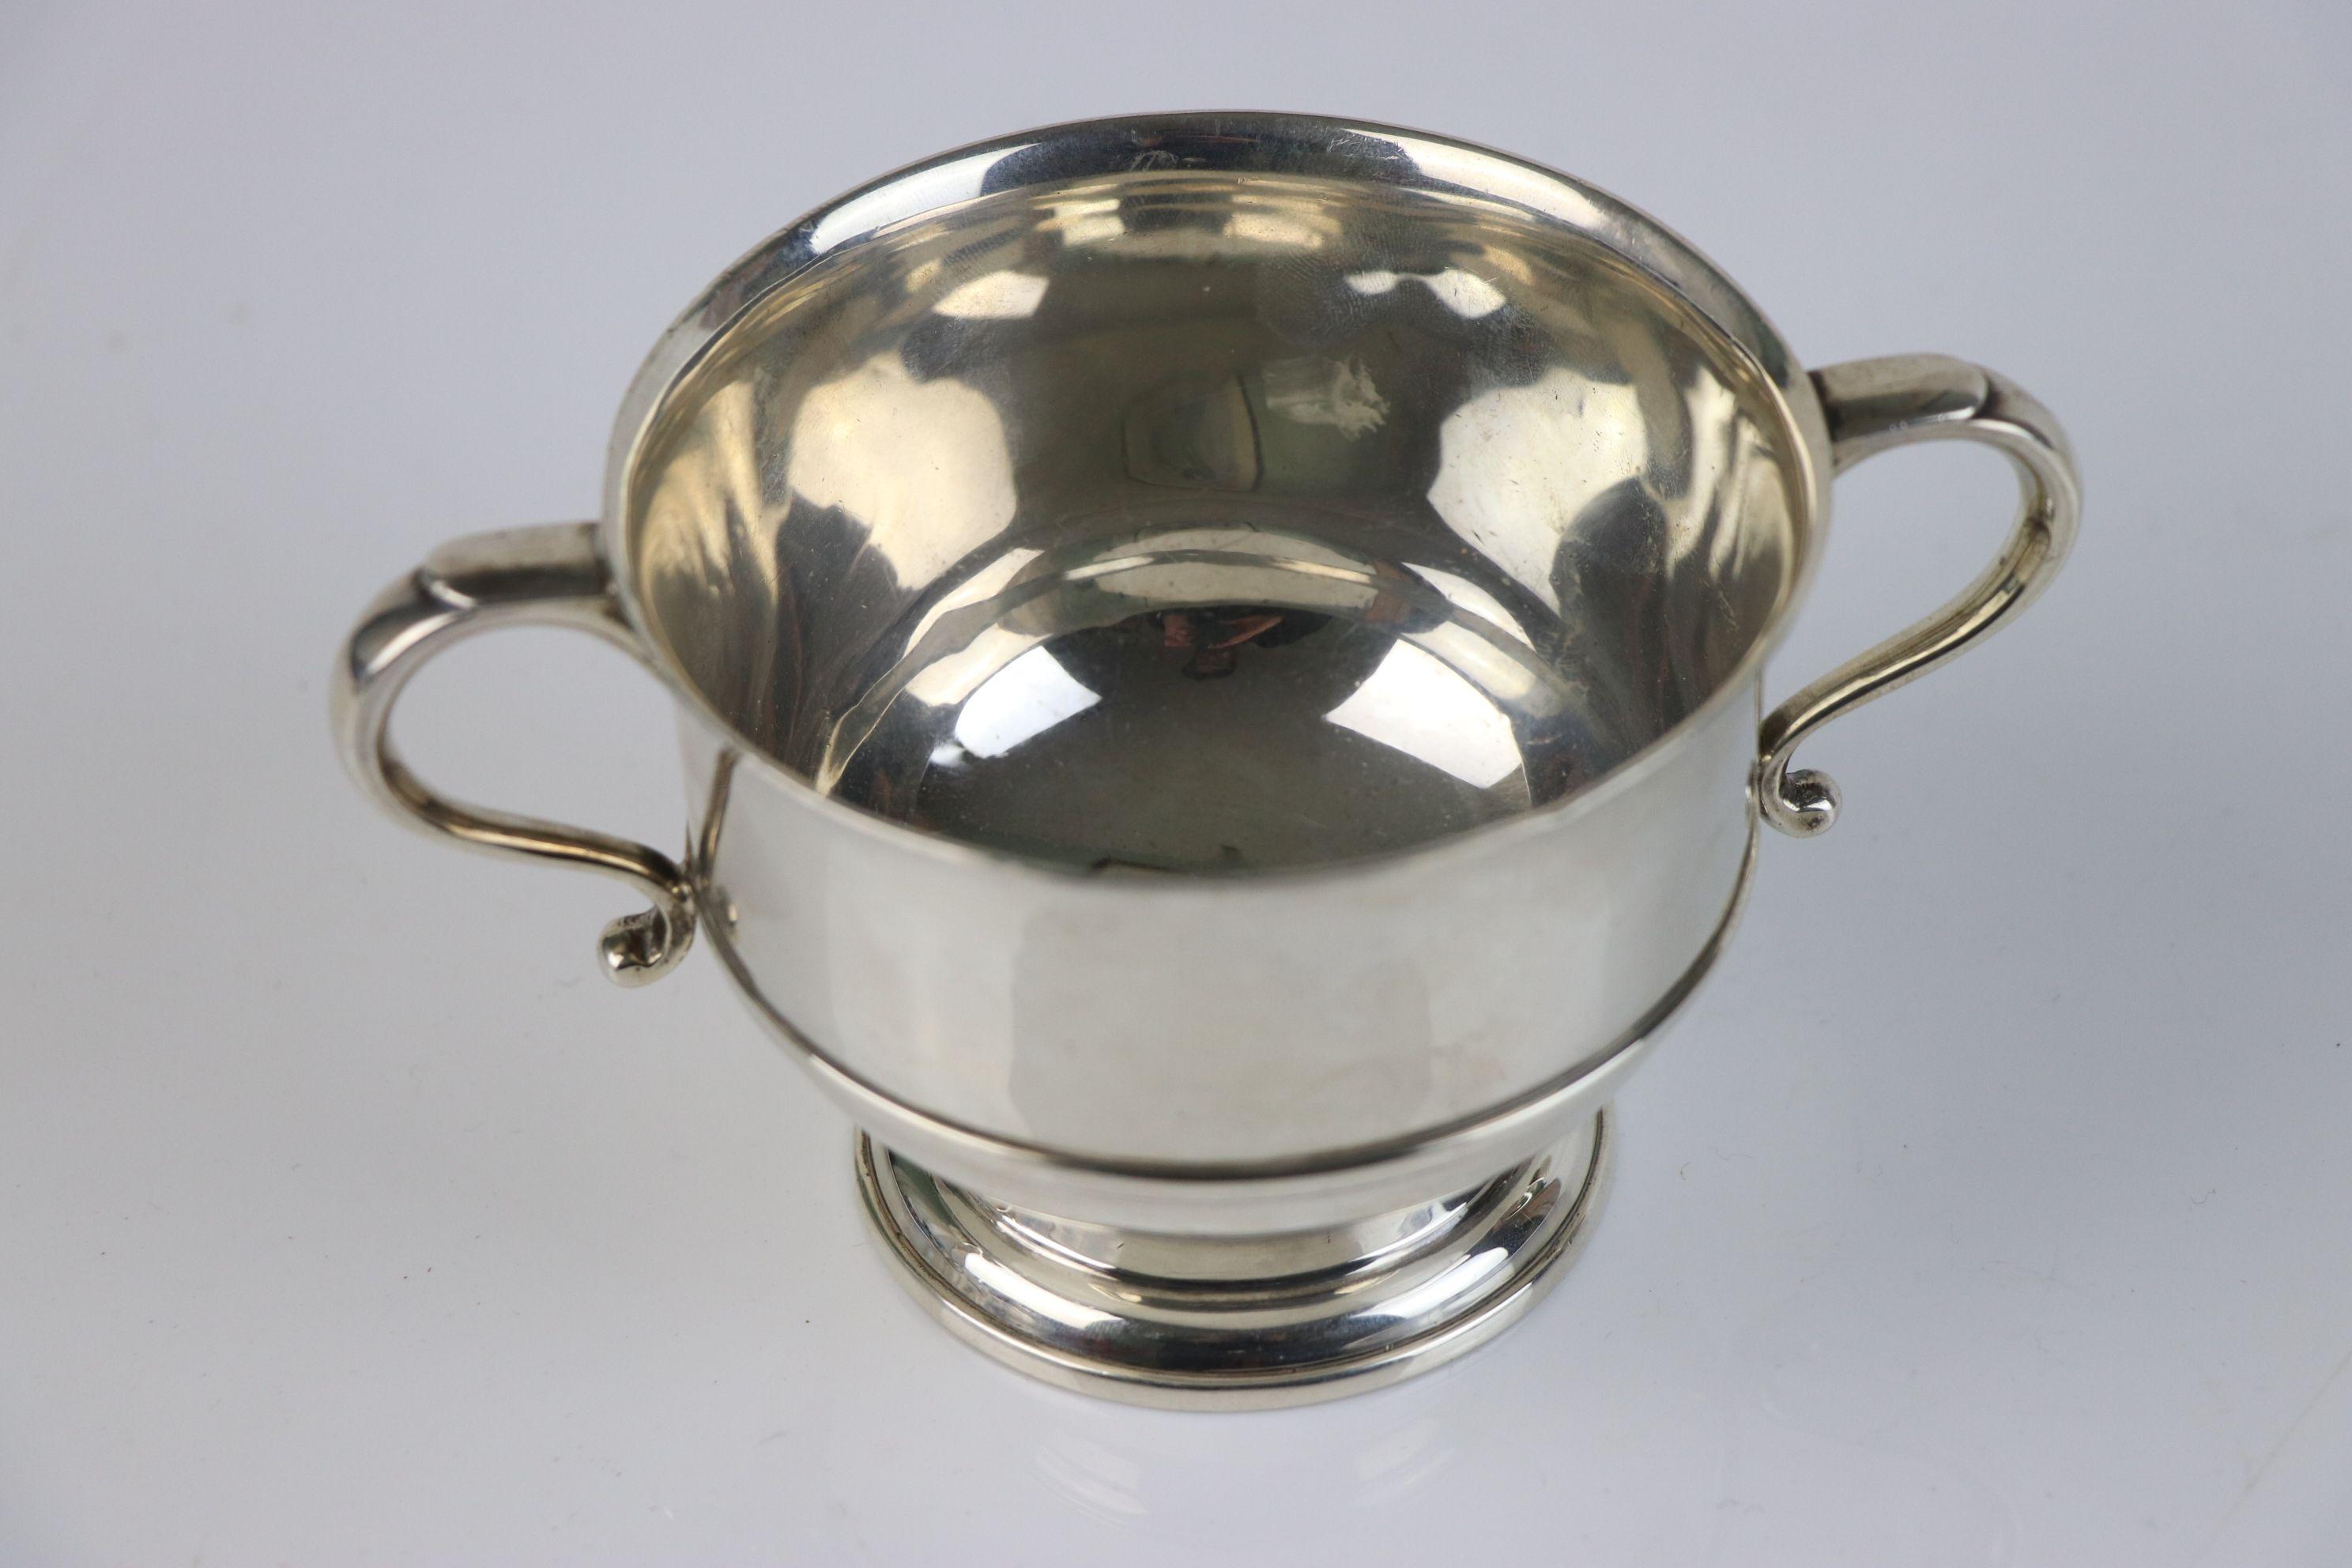 A fully hallmarked sterling silver porringer, maker marked for Mappin & Webb, assay marked for